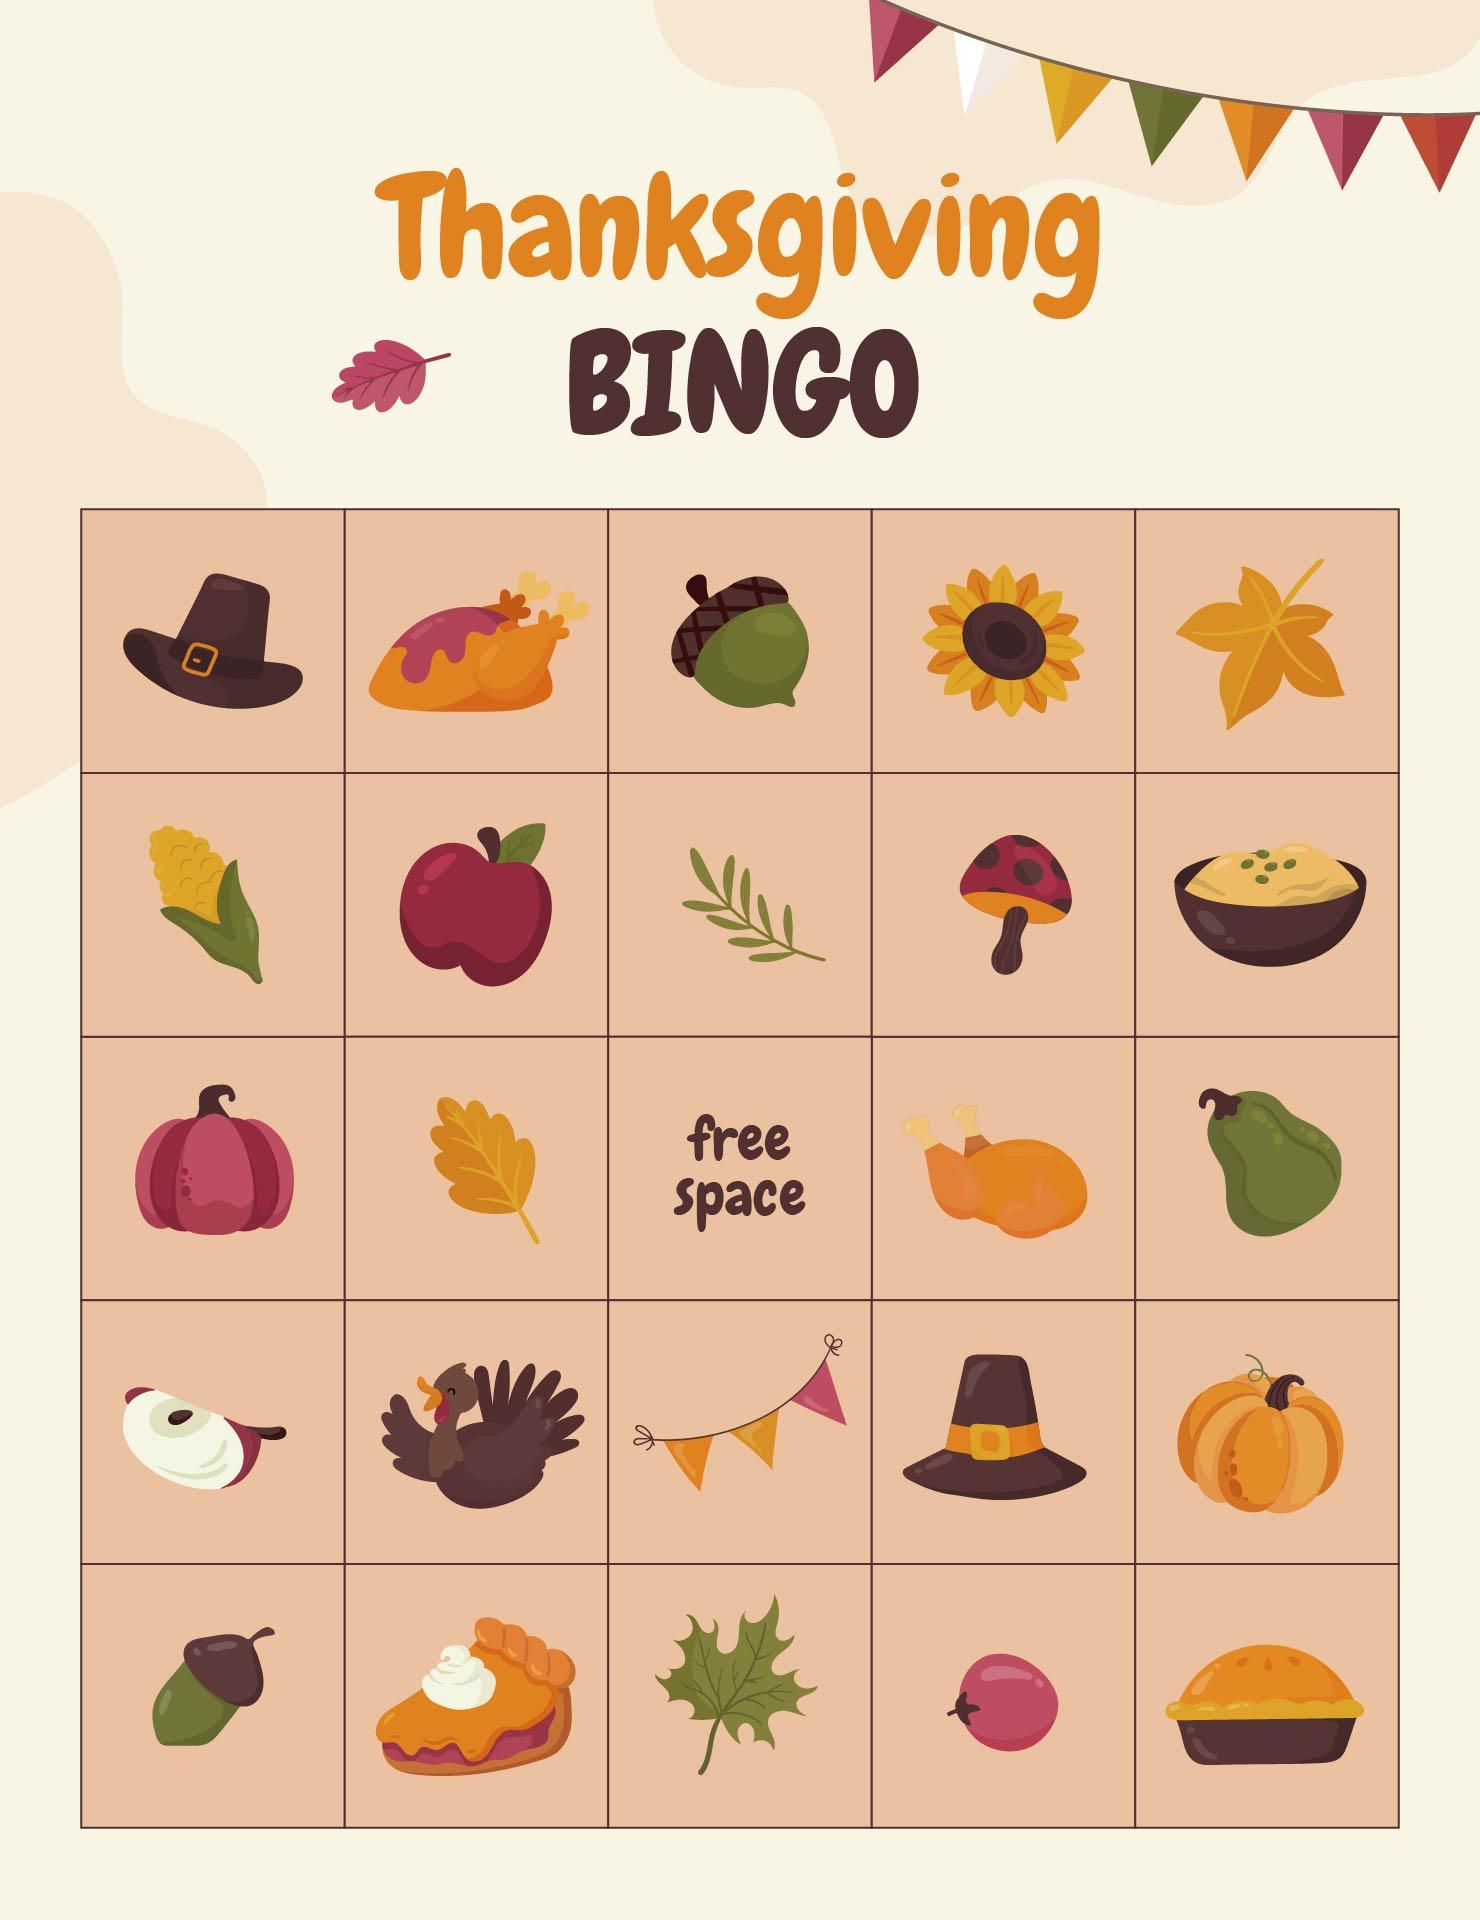 7 Images of Free Printable Thanksgiving Bingo Sheets